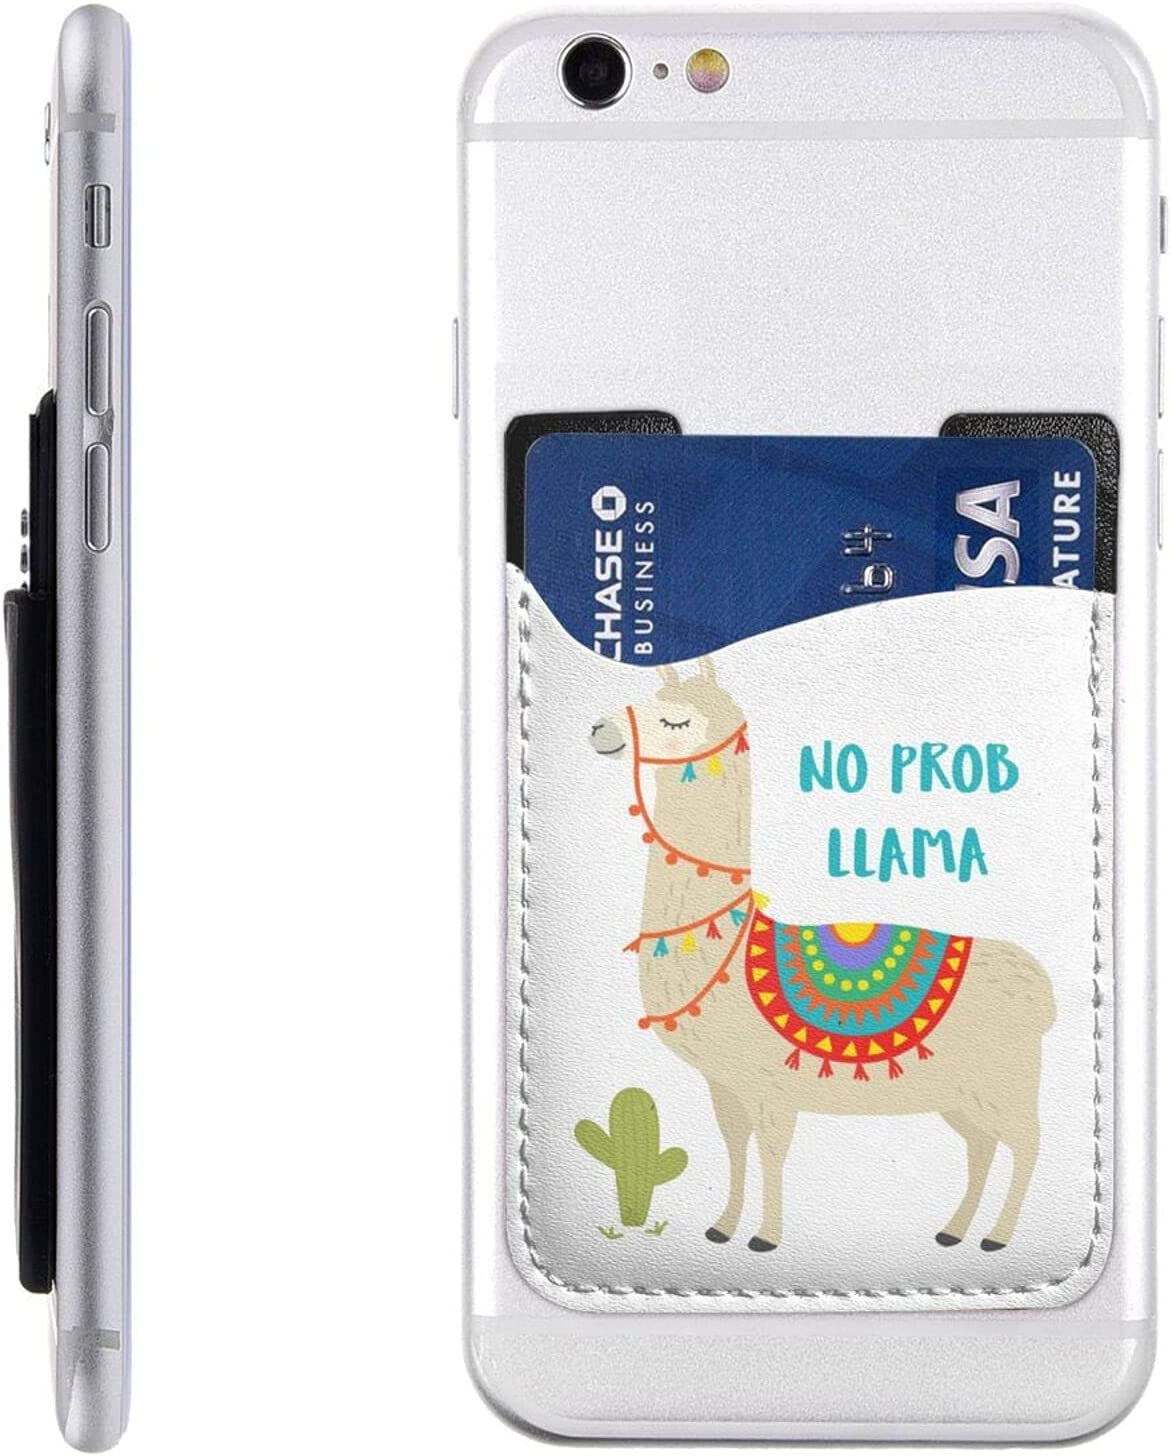 Indefinitely Cute Cartoon Llama Cactus Phone Stick Card Cell On Cheap Holder